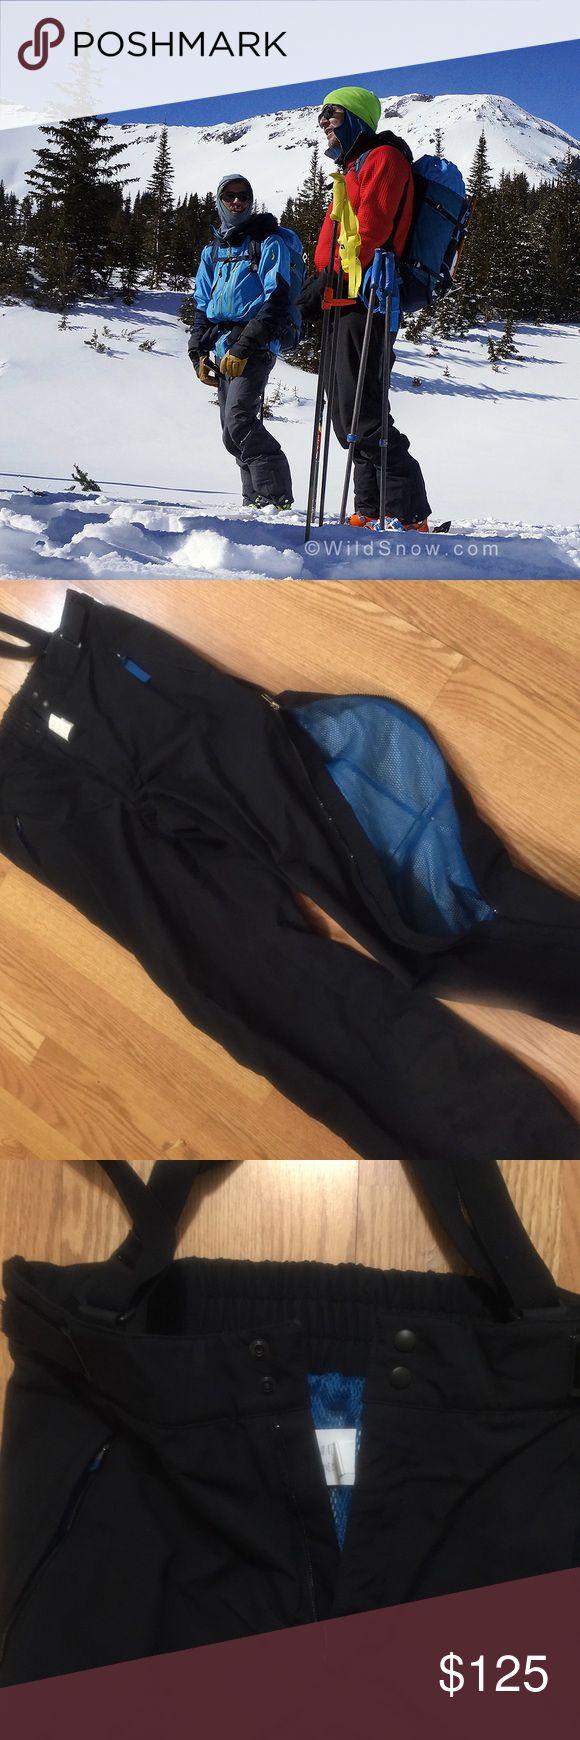 Patagonia ski pants BIBS Great condition. Barely used, perfect condition. Patagonia Pants